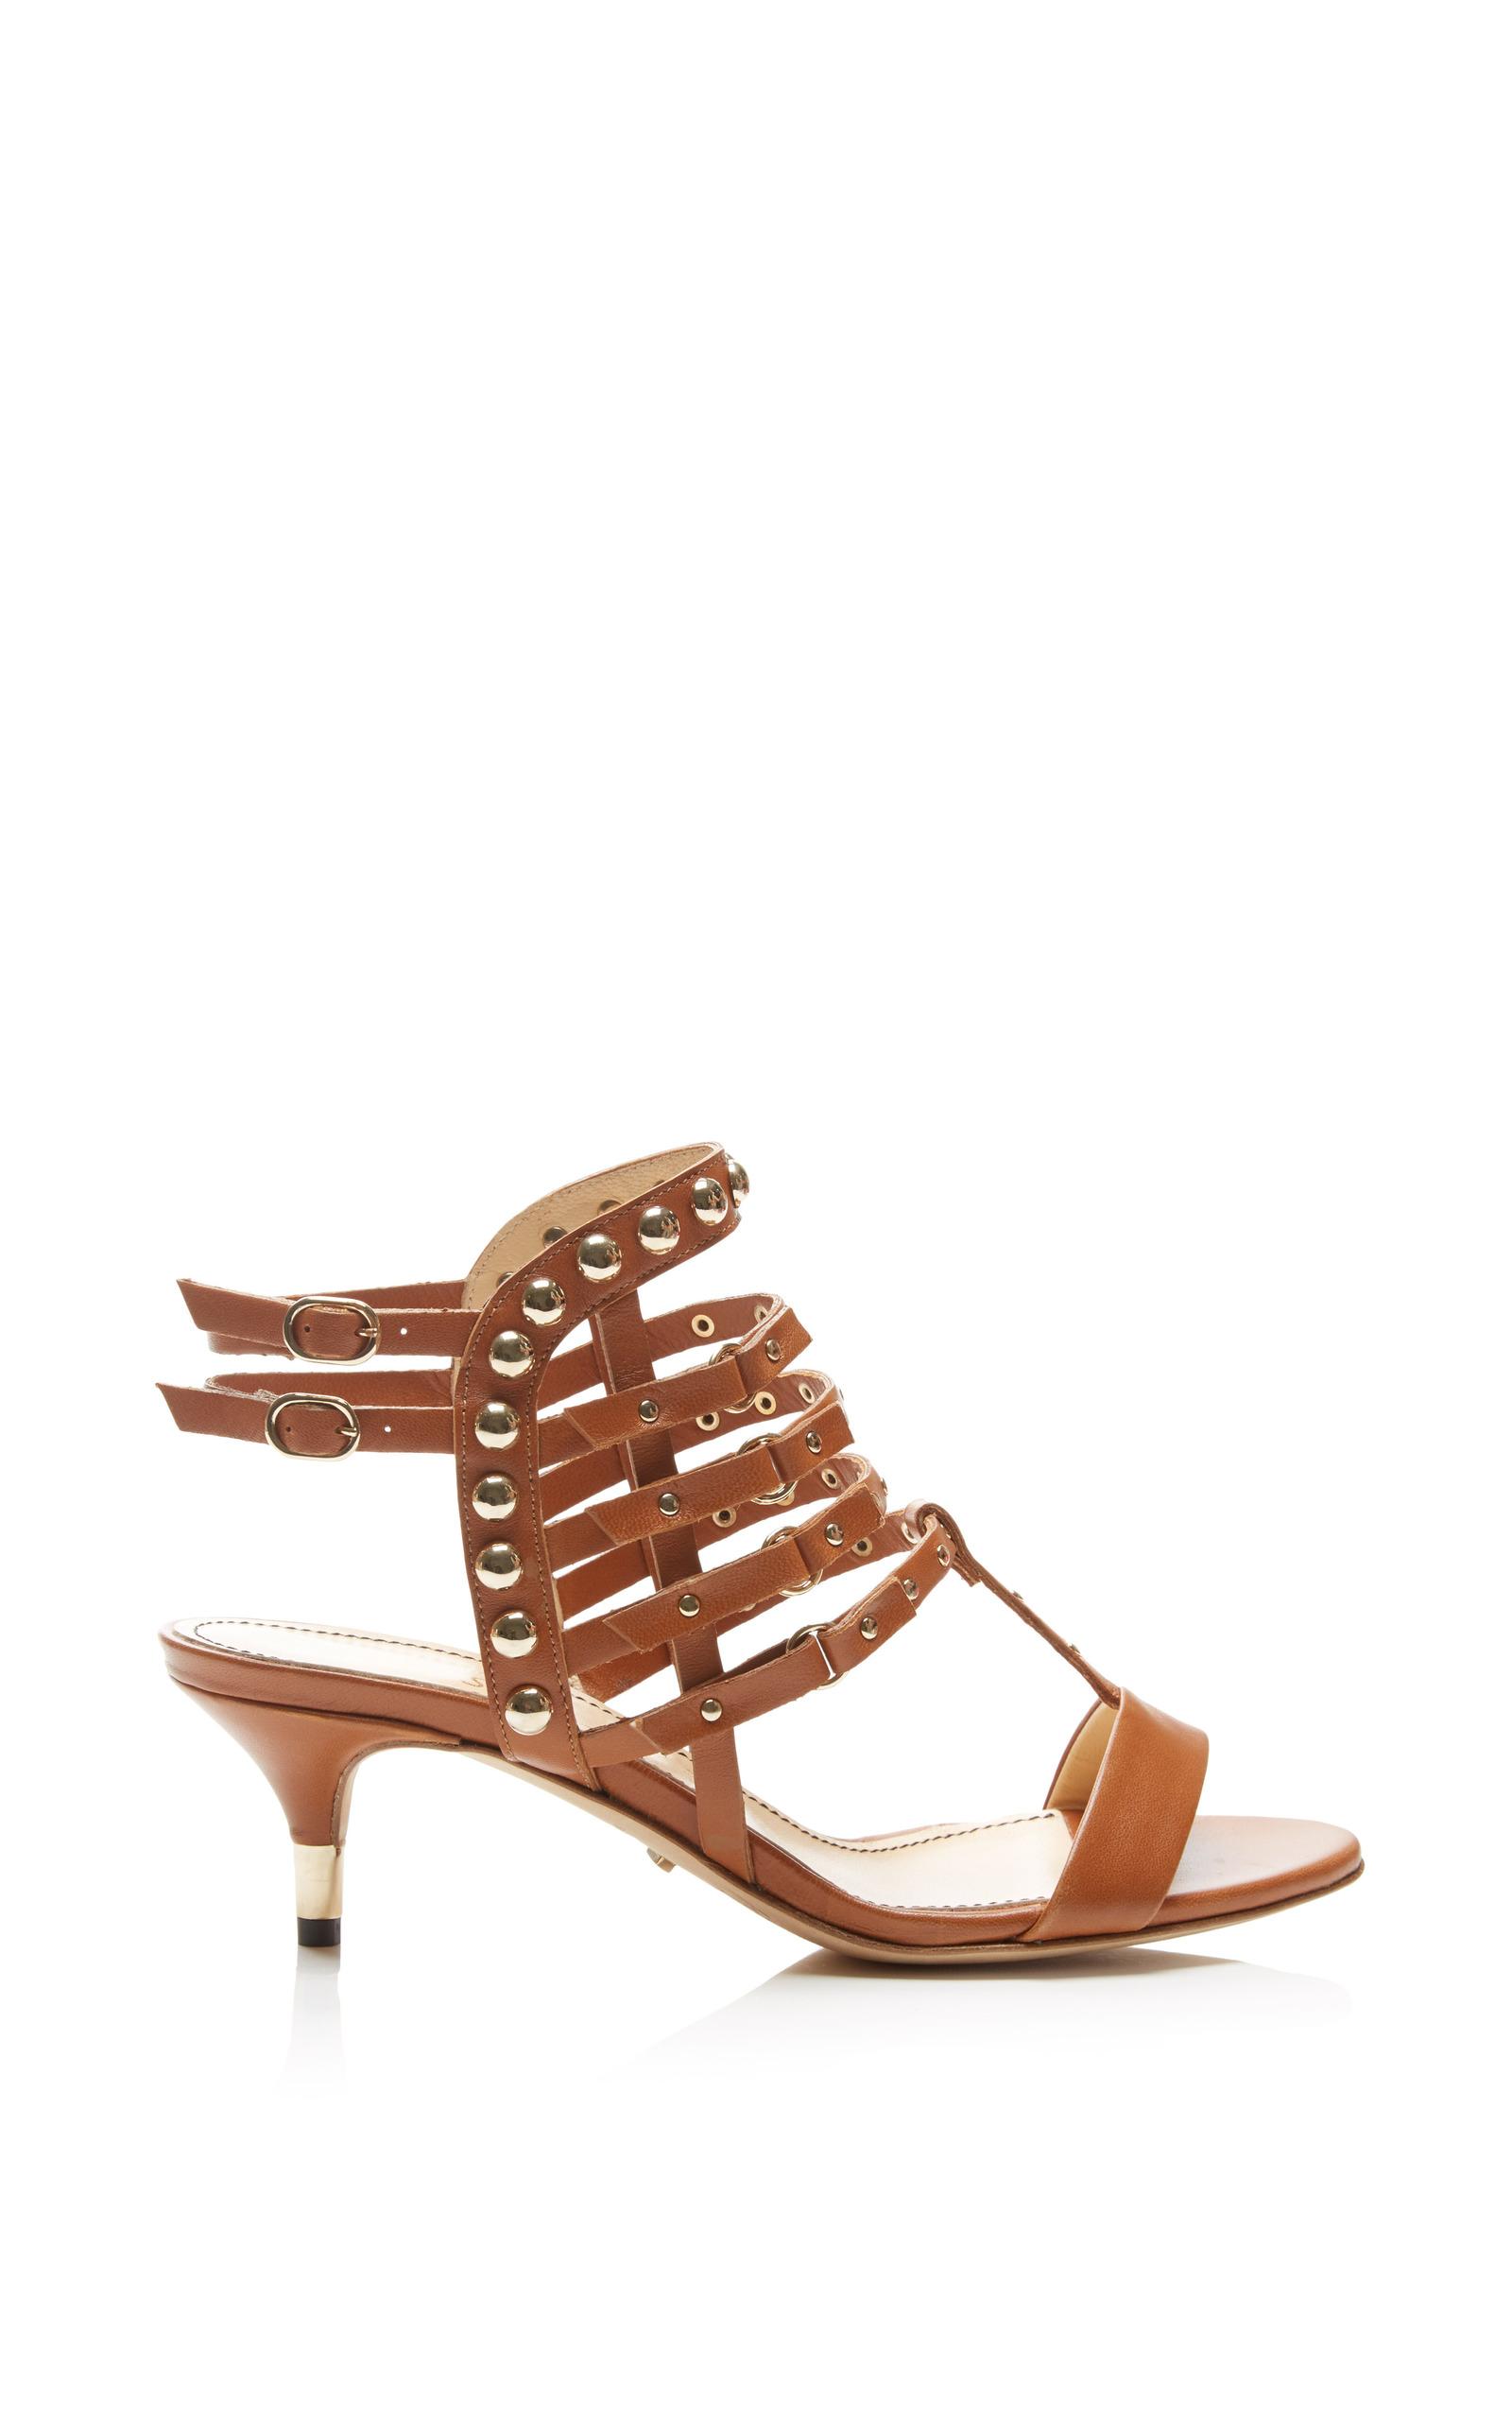 d837ed07607 Jerome C. RousseauCamden Kitten Heel Sandal In Tan. CLOSE. Loading